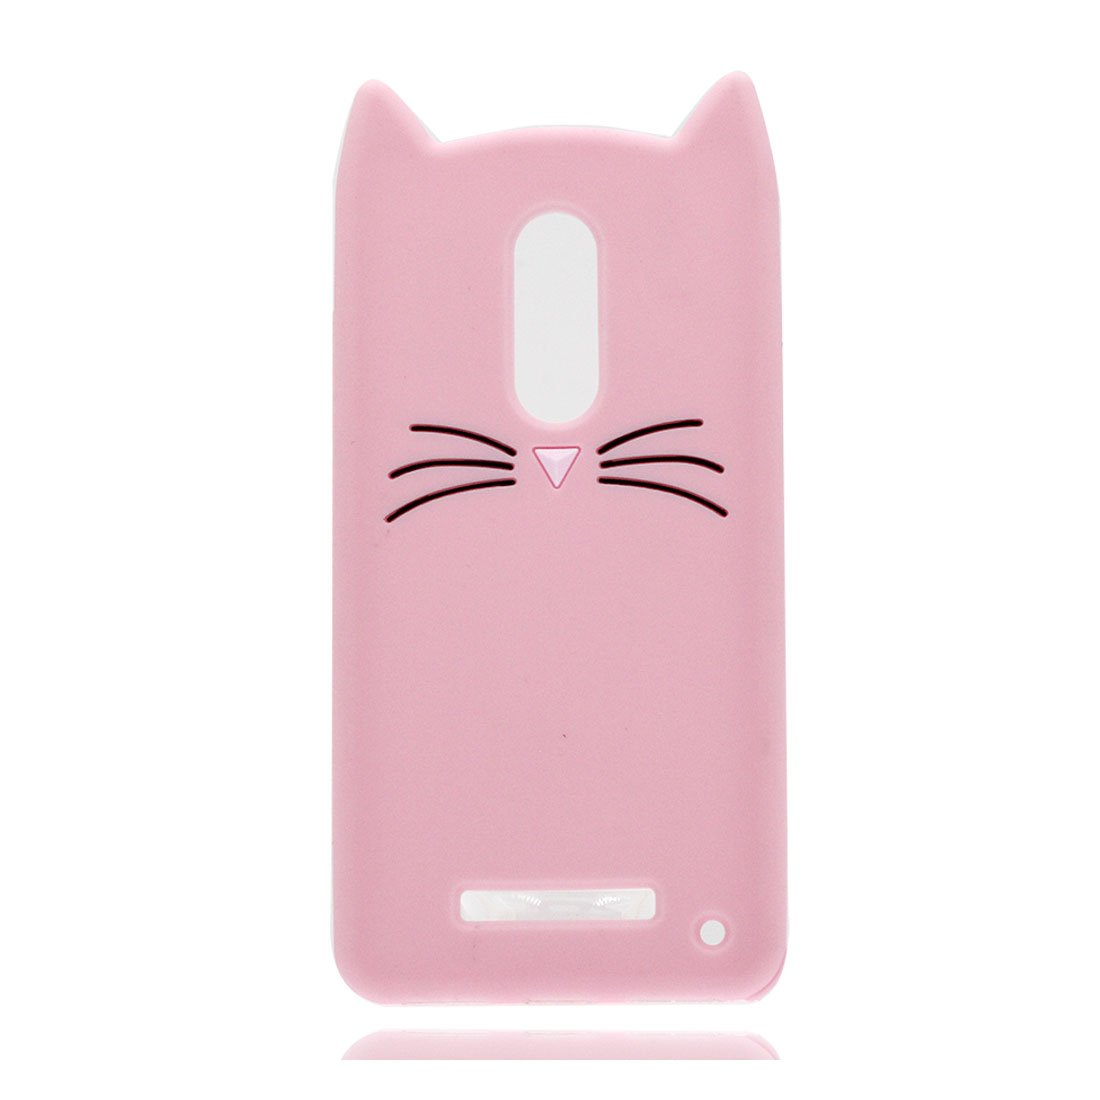 Redmi Note 3/Note 4/ Note 4X Carcasa, Slim-Fit Anti-Scratch a prueba de golpes Funda de silicona suave con 3D Cartoon Lindo Cat Gato funda para Redmi Note 3/Note 4/ Note 4X (rosado) UJVU